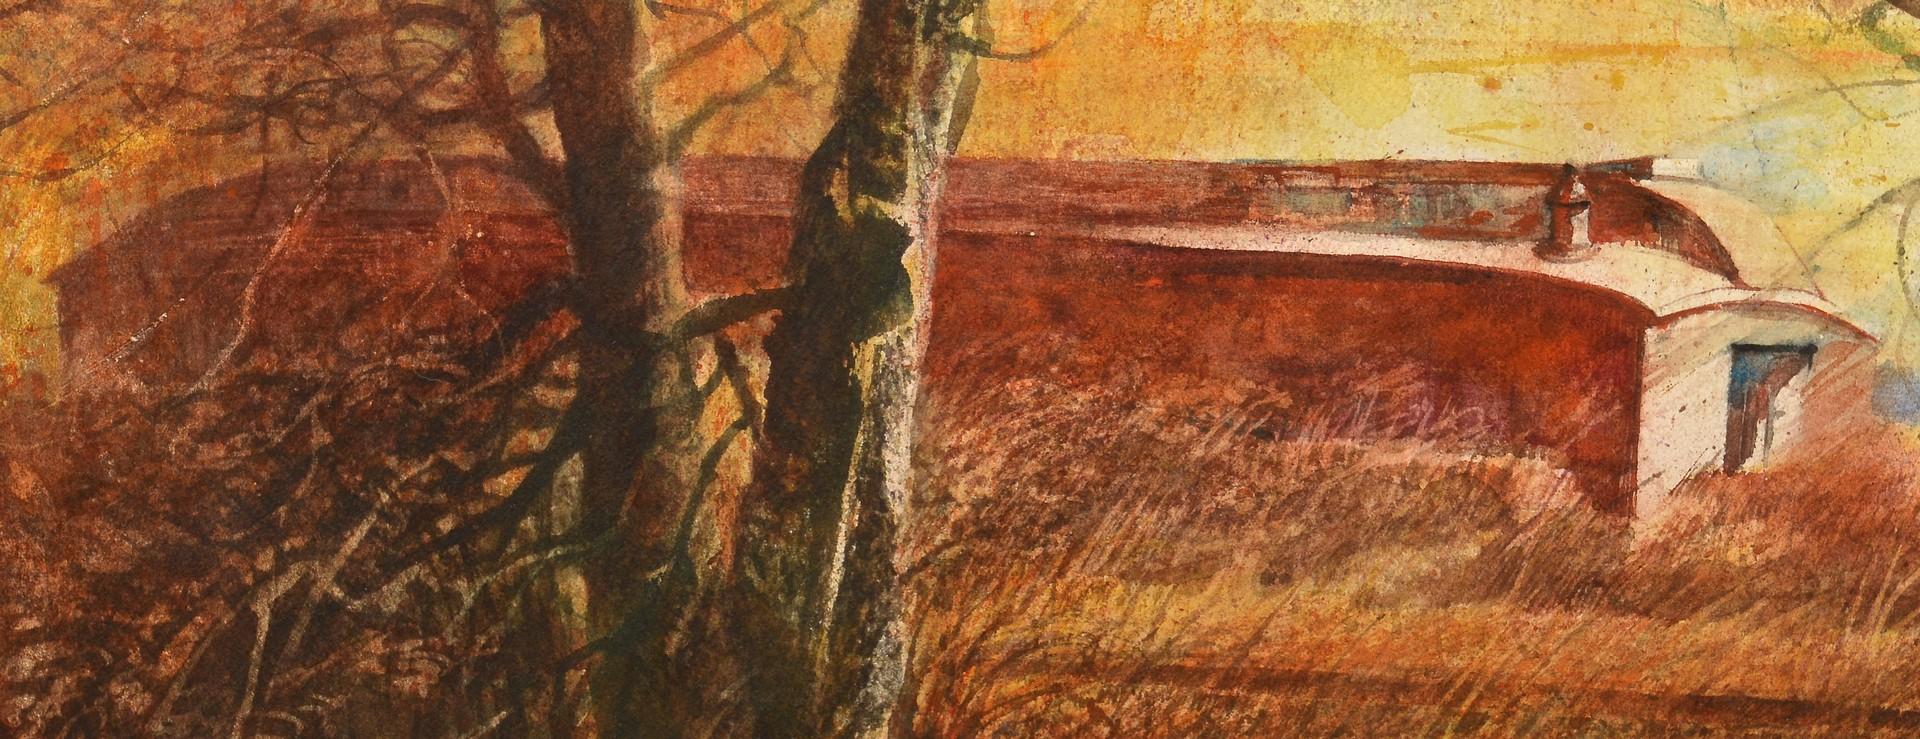 Lot 662: 2 Carl Sublett Watercolor landscapes